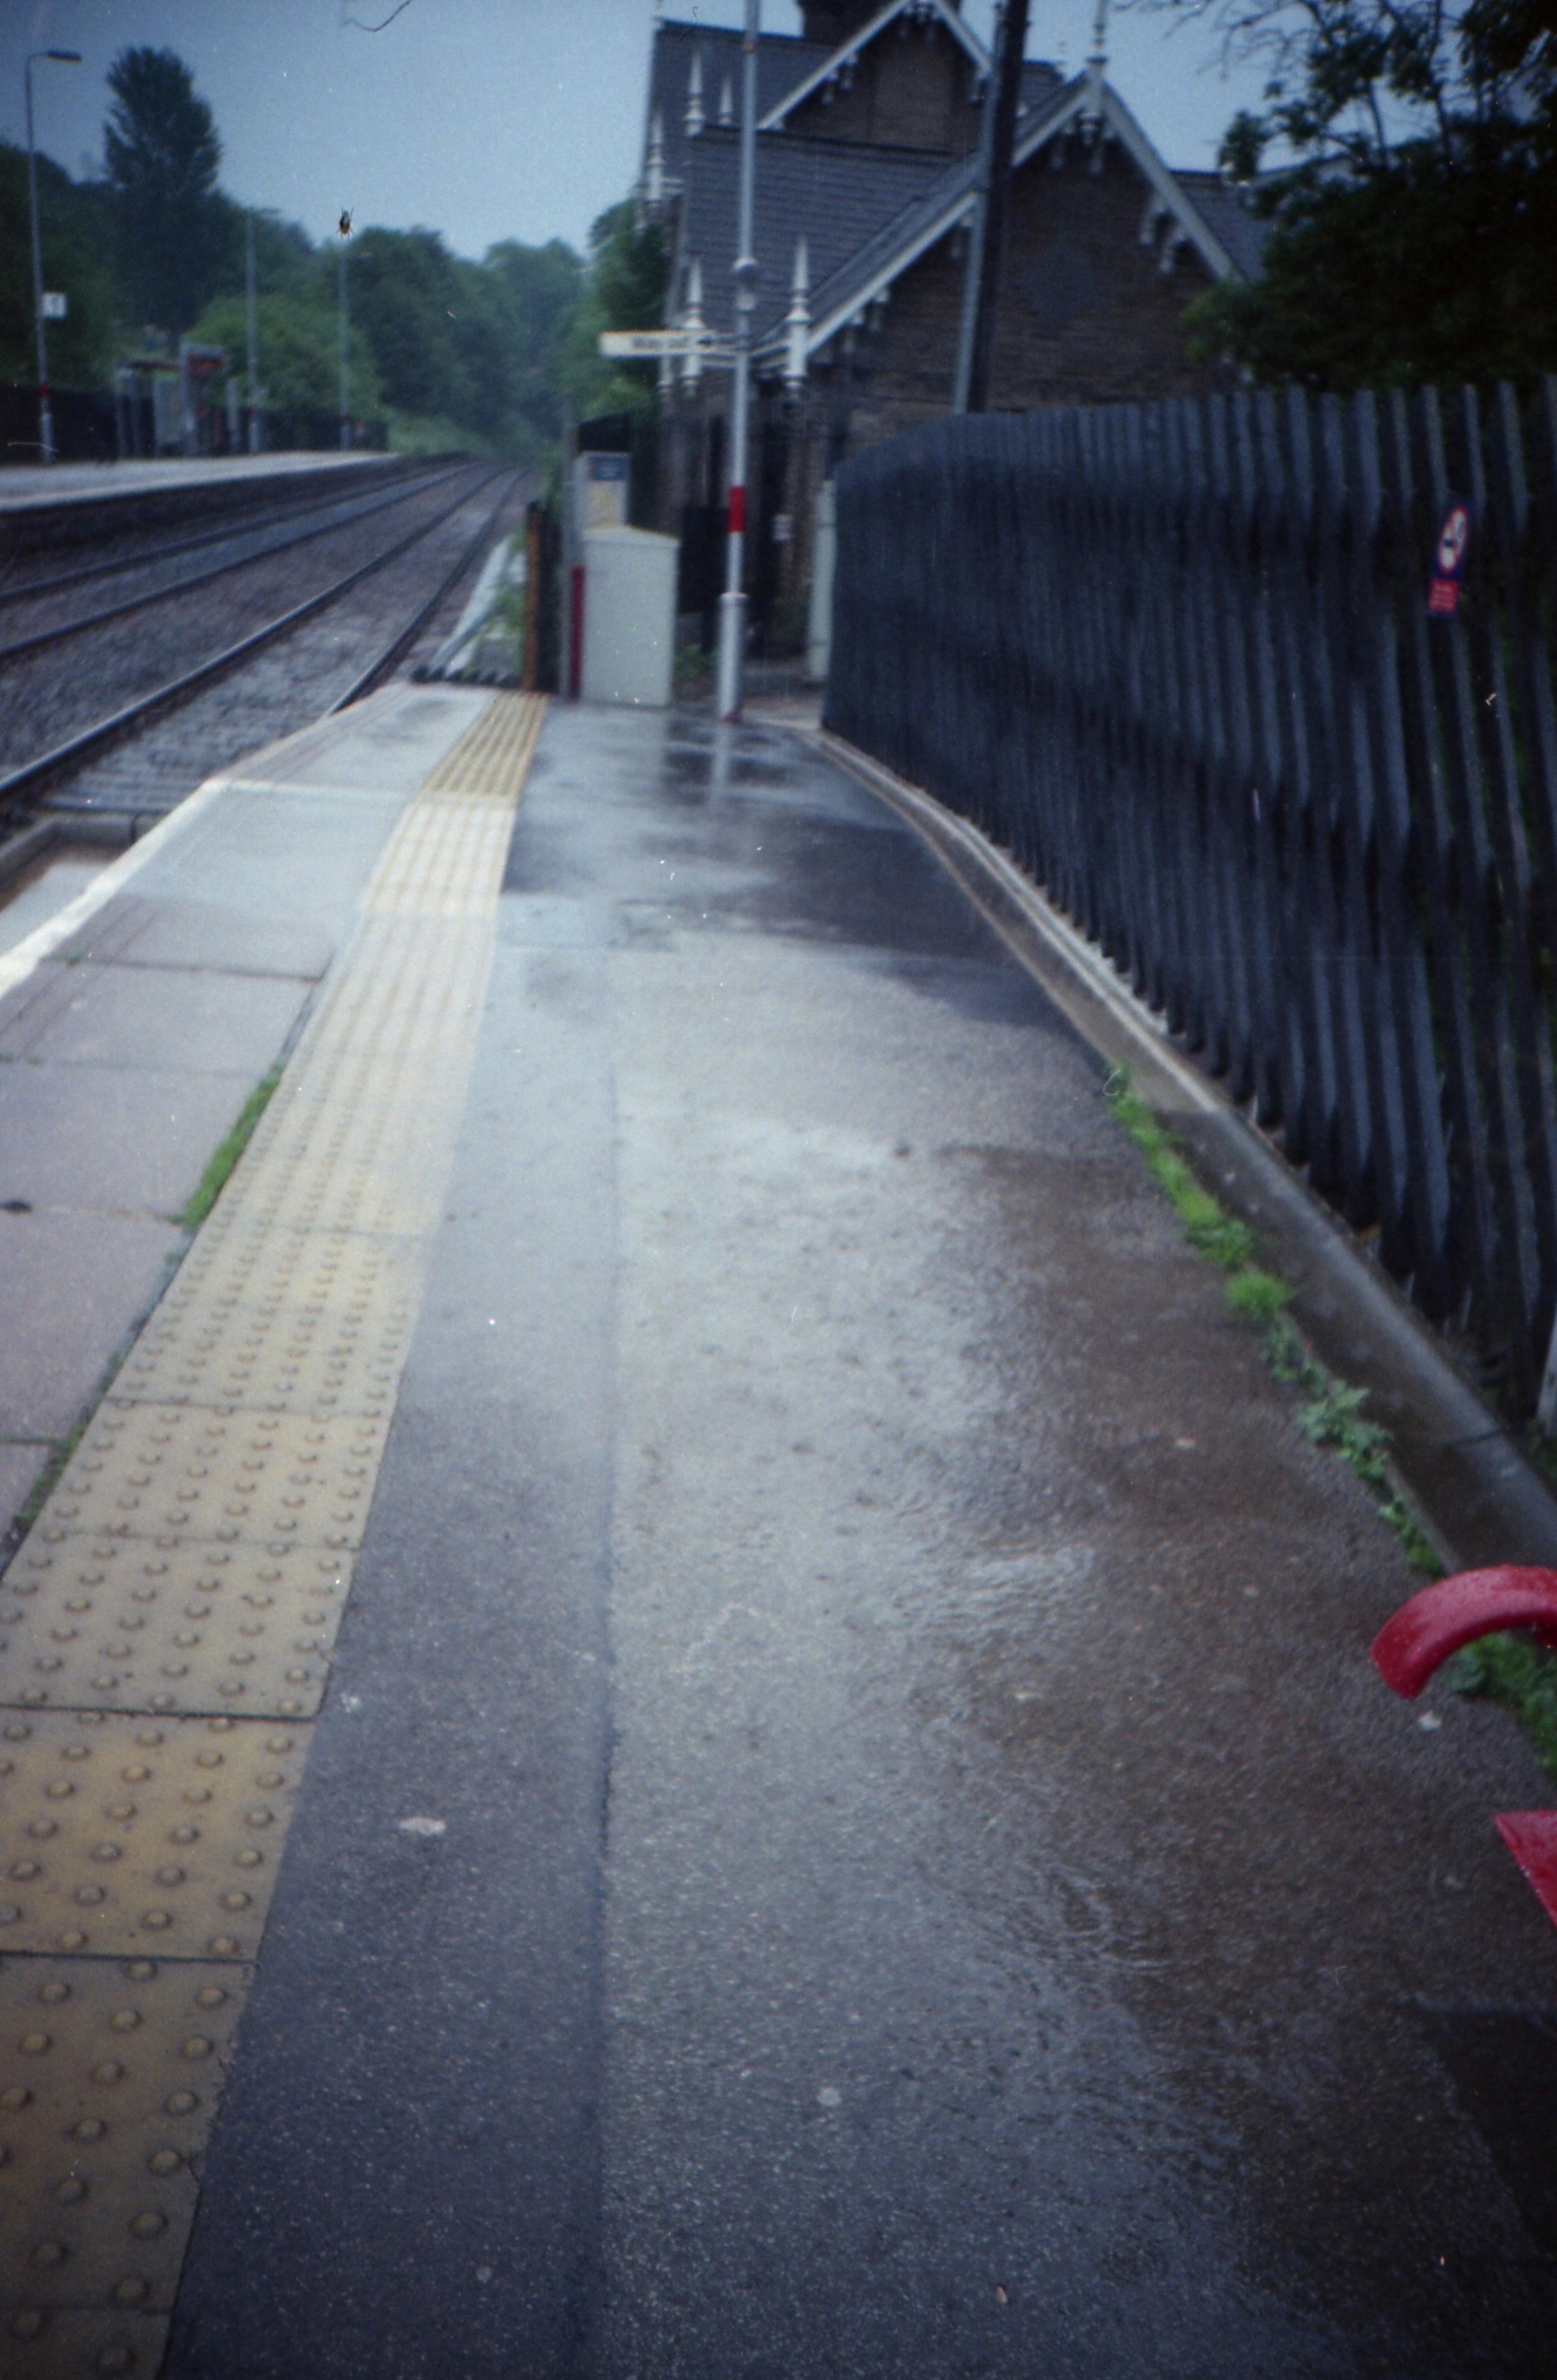 162/366 - It rained. A lot.